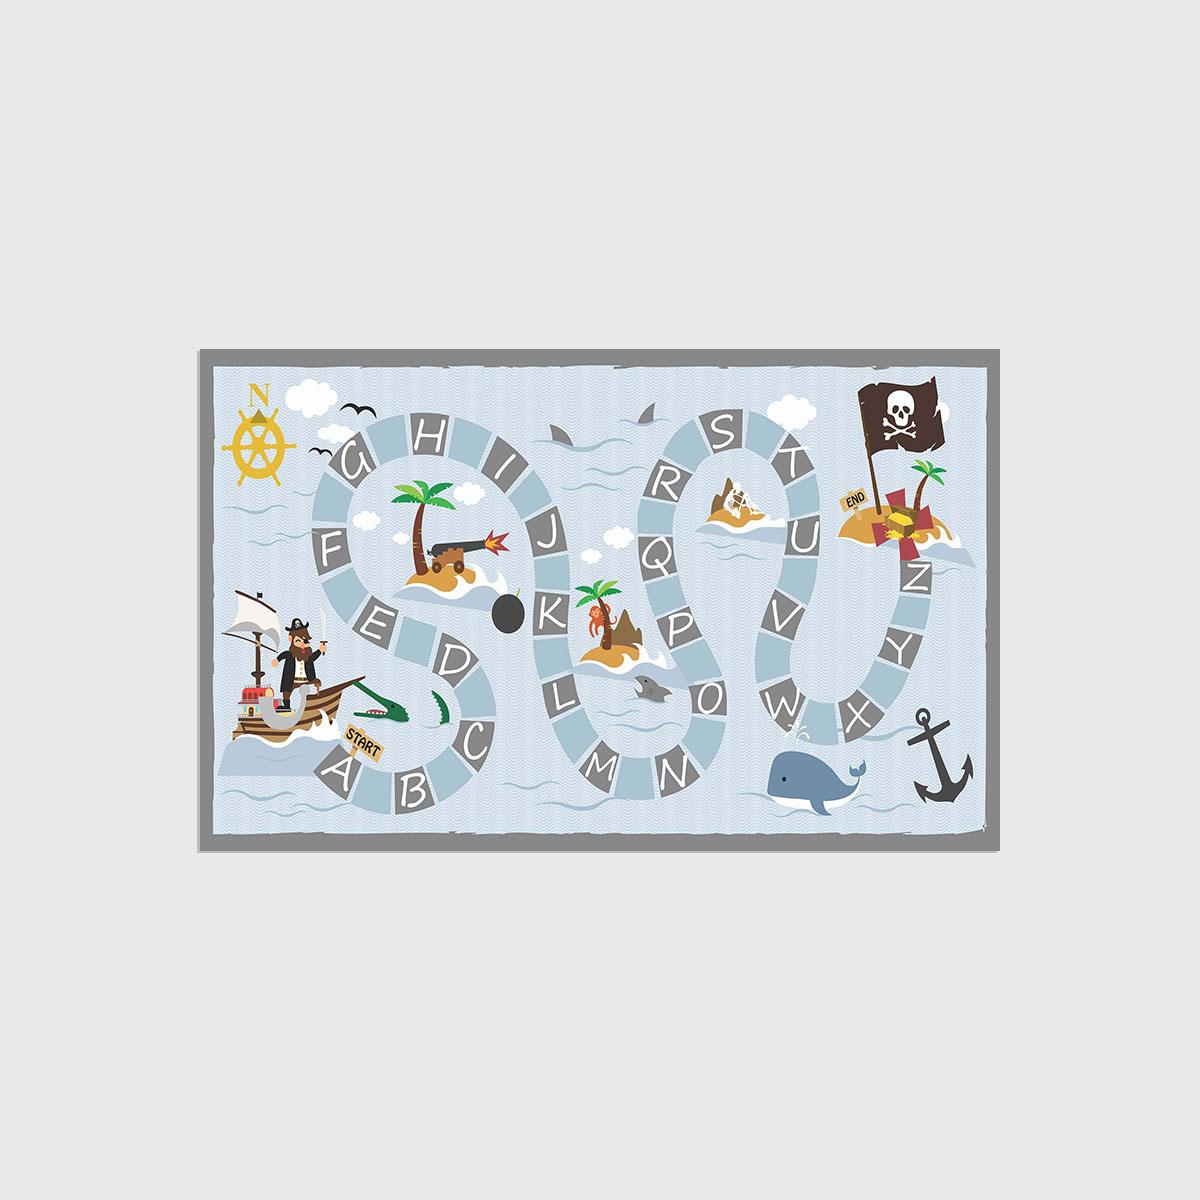 Playmat mapa do tesouro